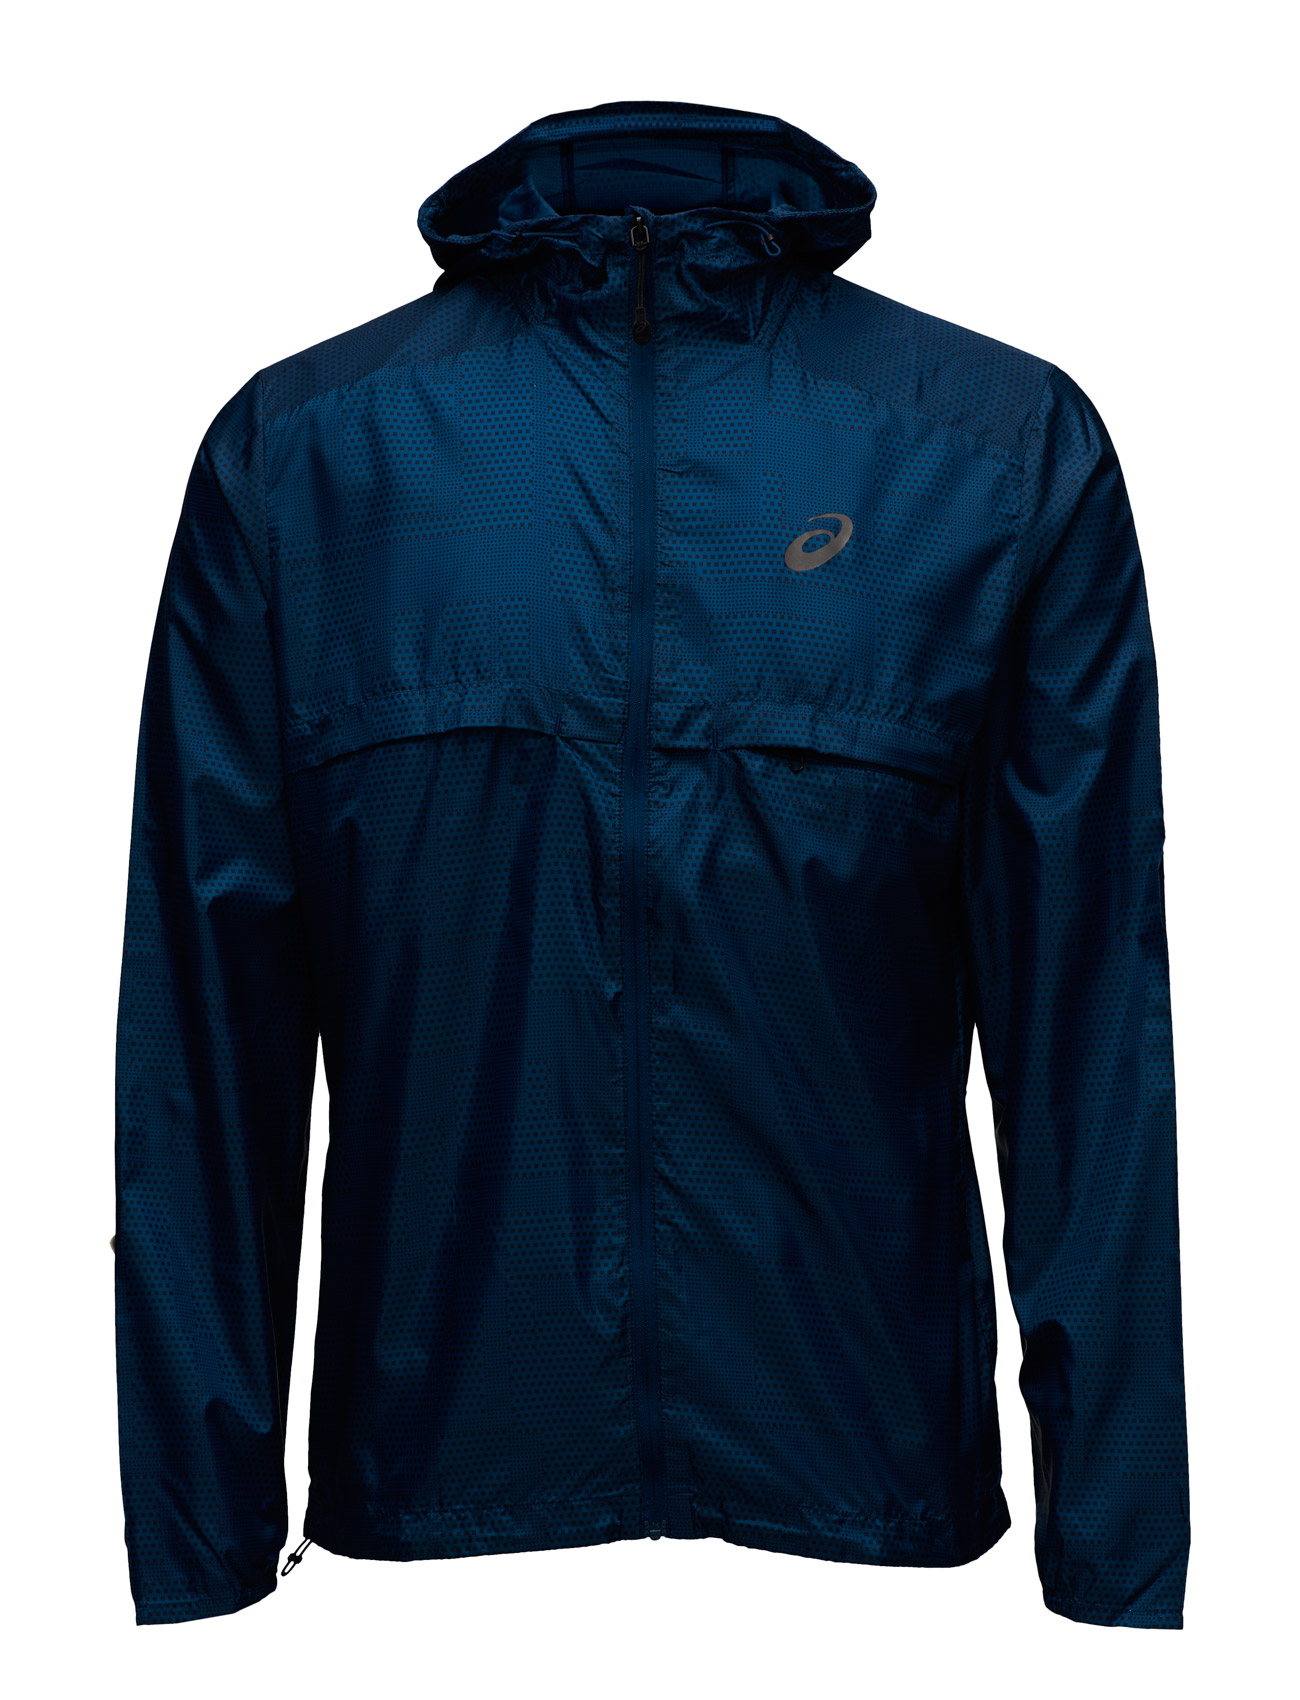 129931-FuzexåÊPackable Jacket Asics Sportsjakker til Mænd i